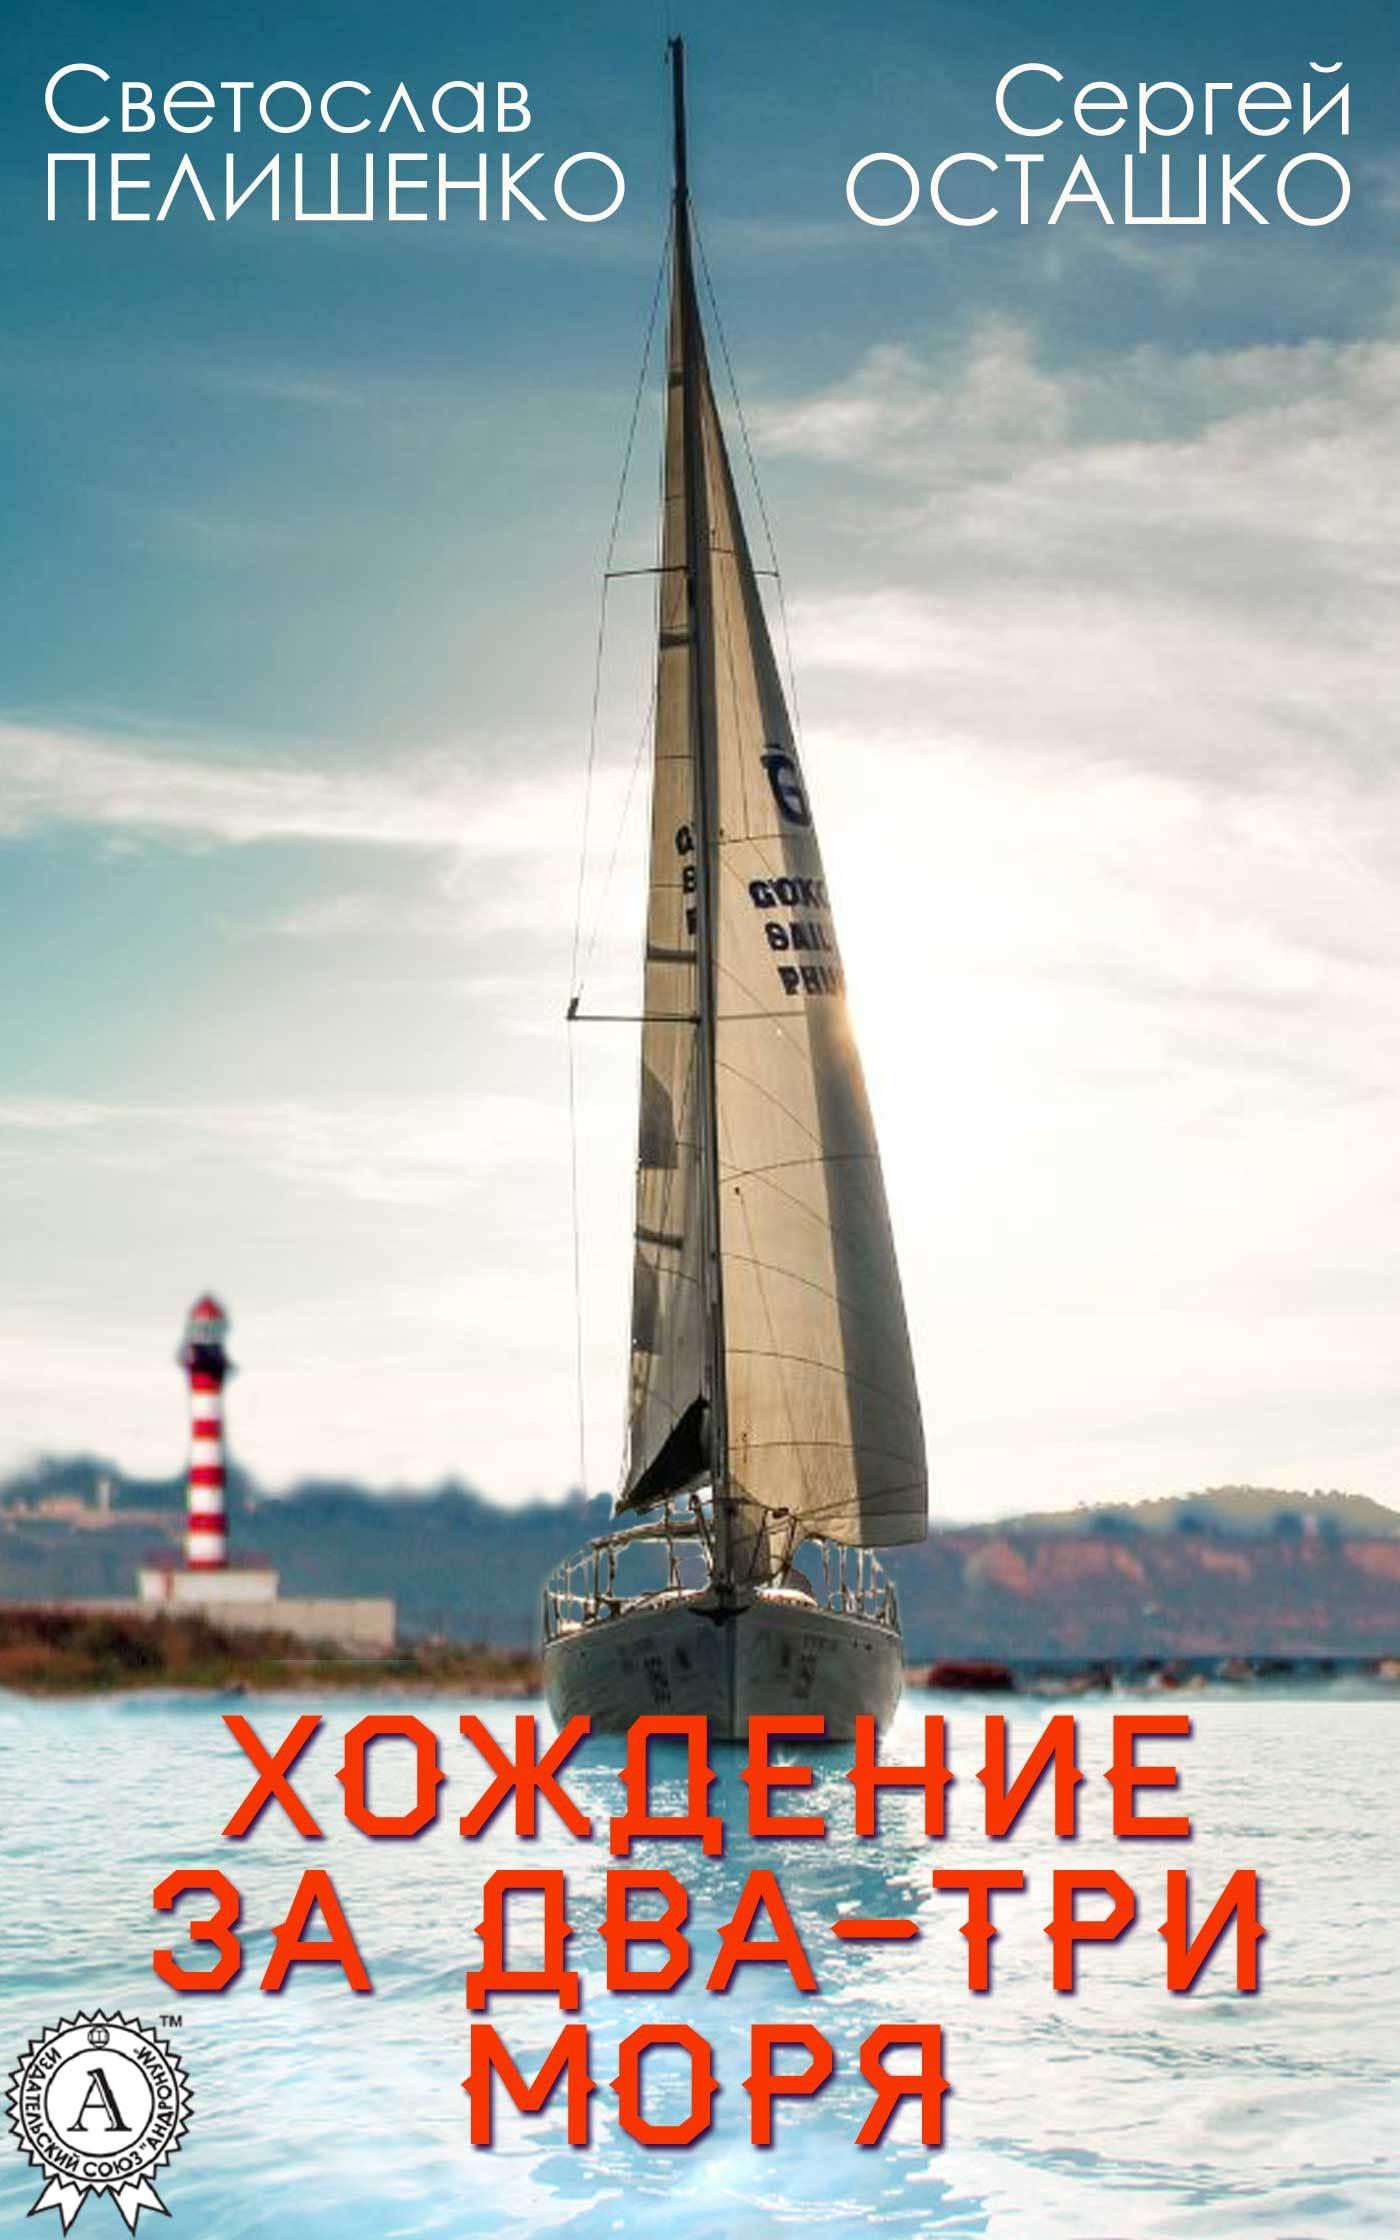 Сергей Осташко, Светослав Пелишенко «Хождение за два-три моря»